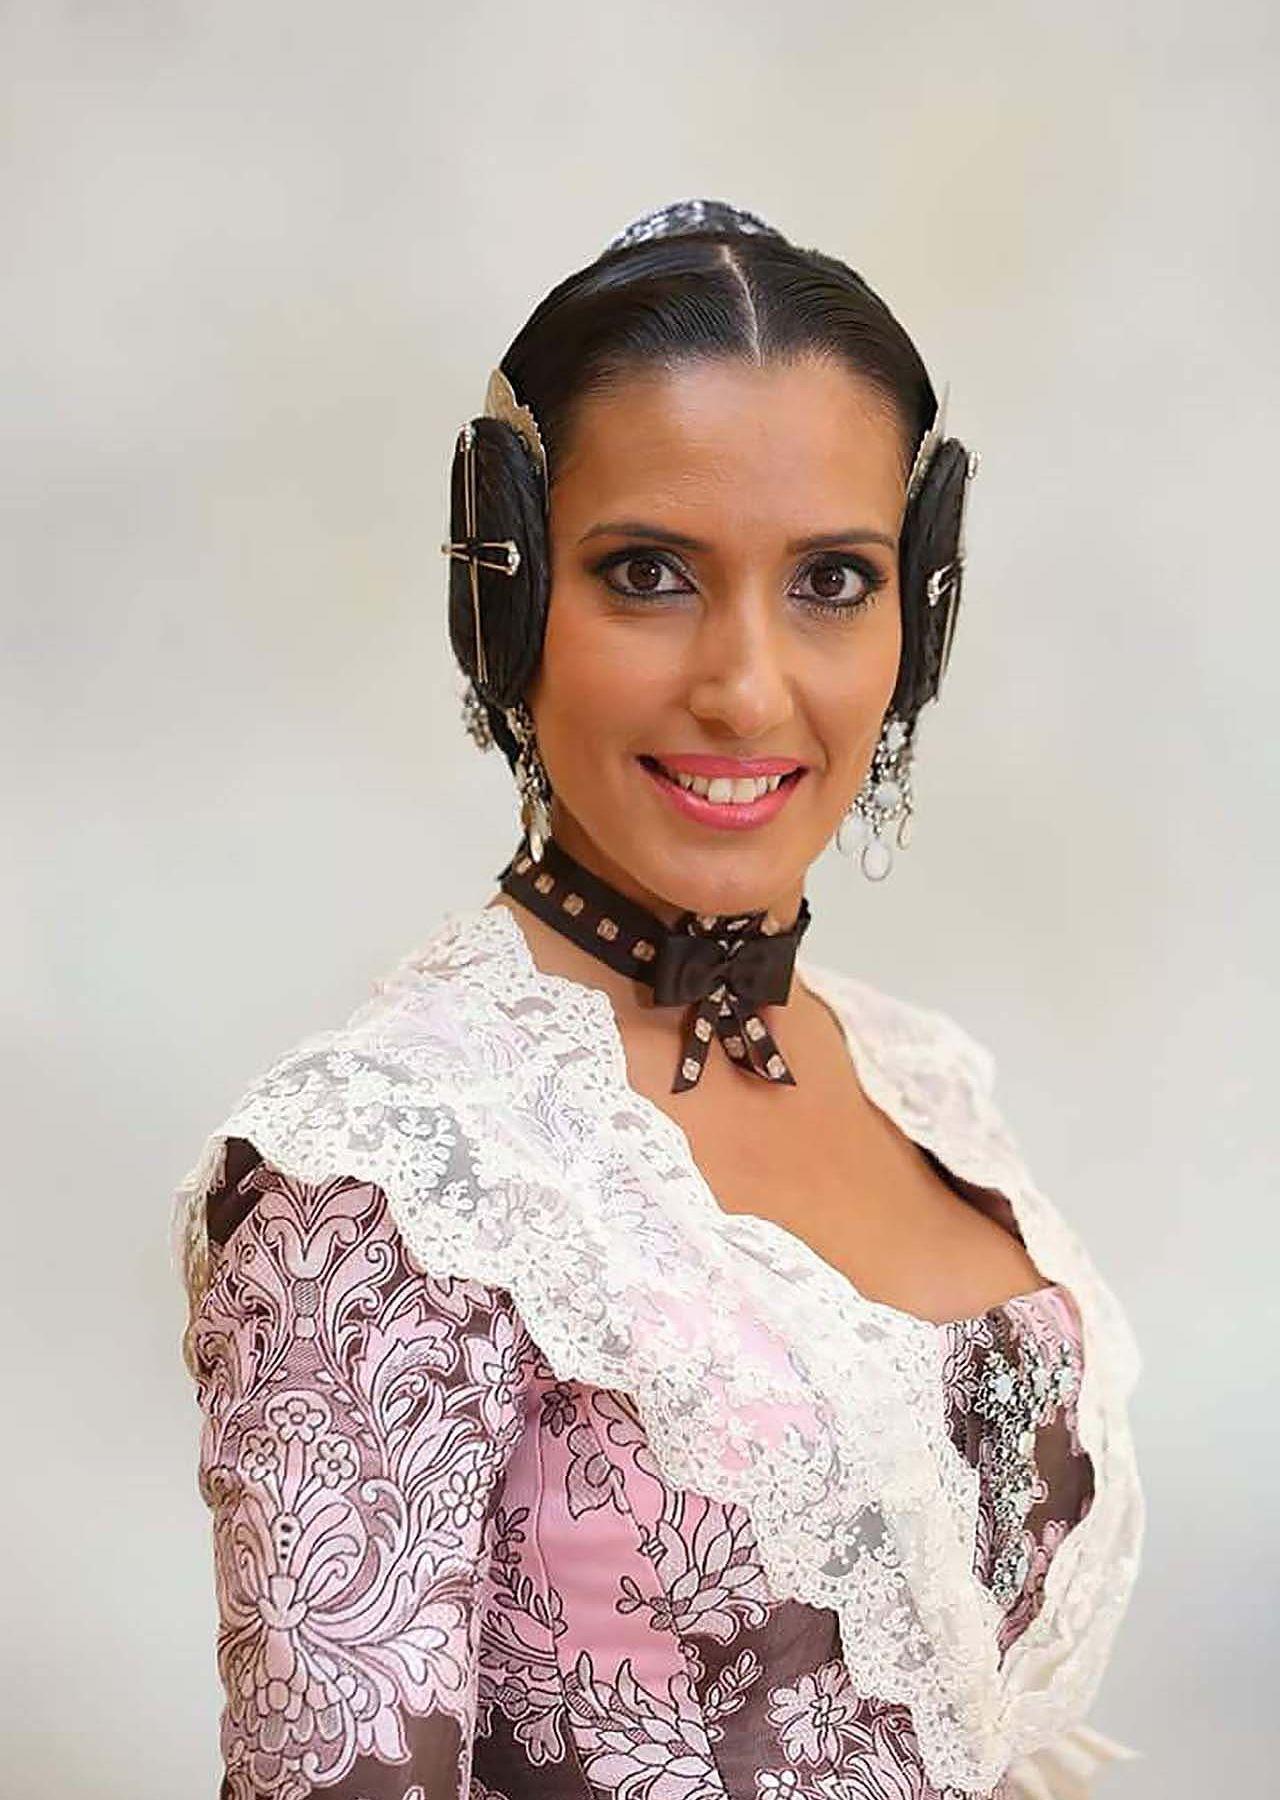 Arantxa Muñoz Giner